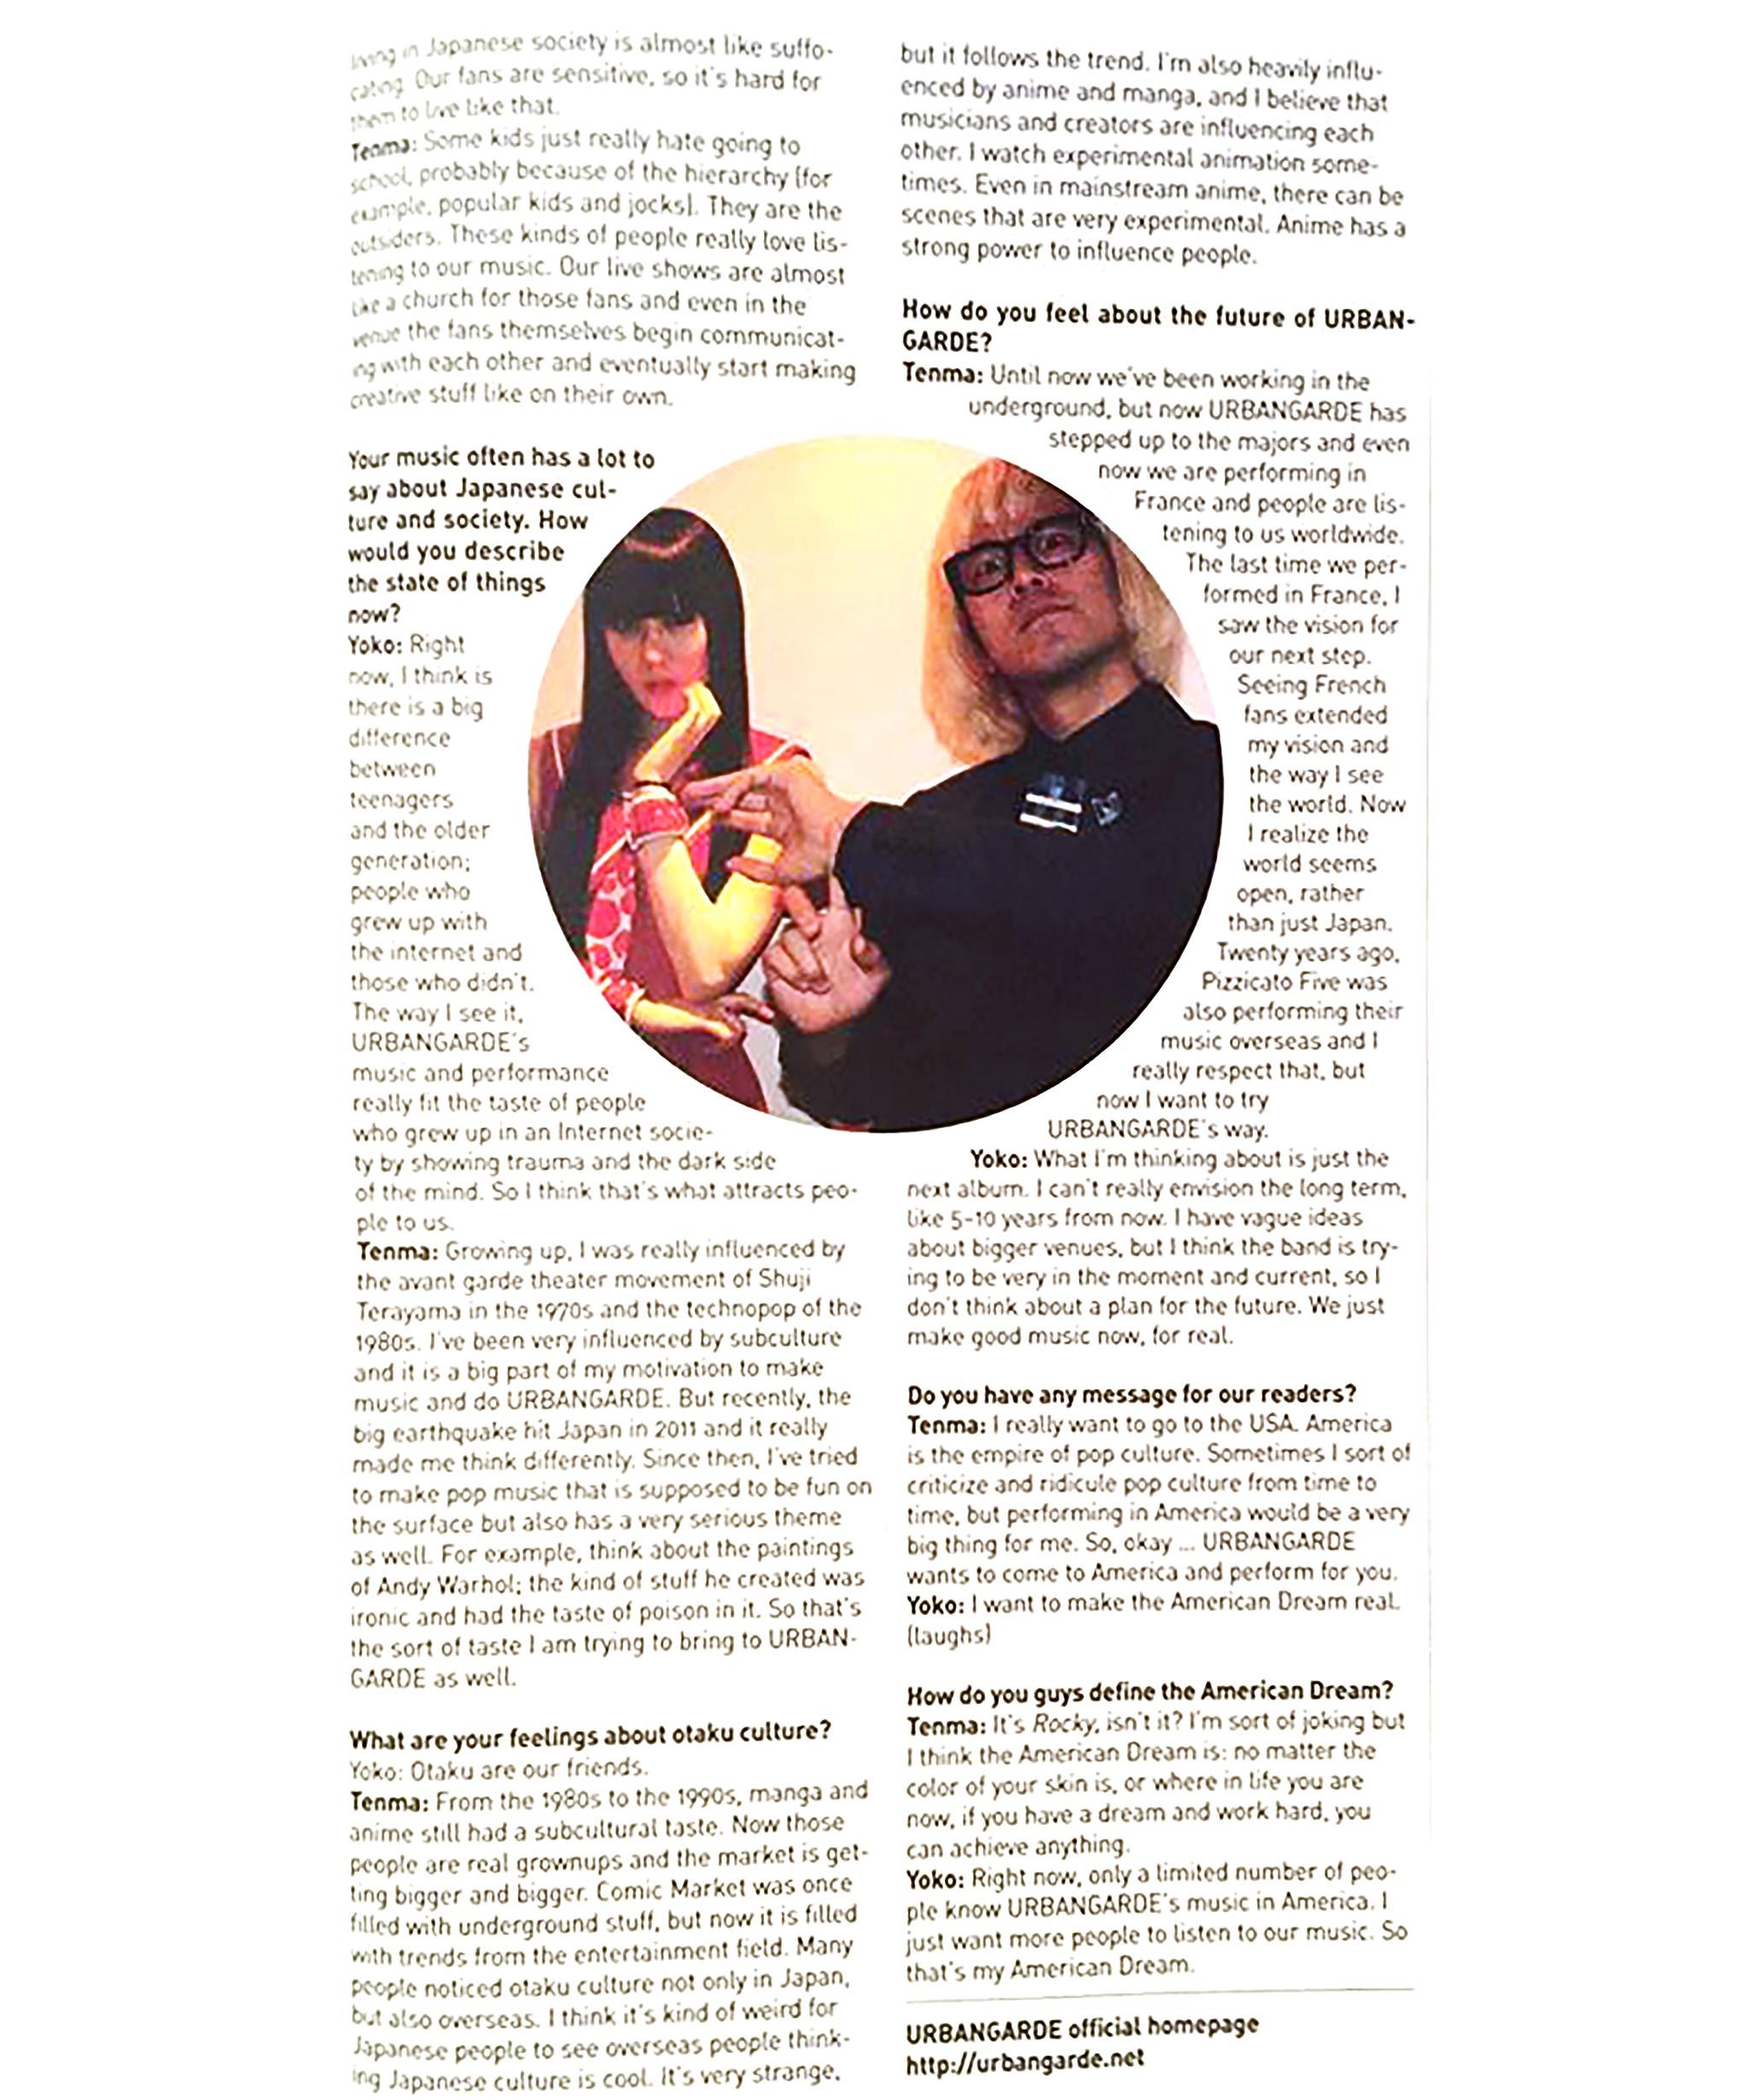 RMMS-URBANGARDE-Otaku-USA-interview-2014-B